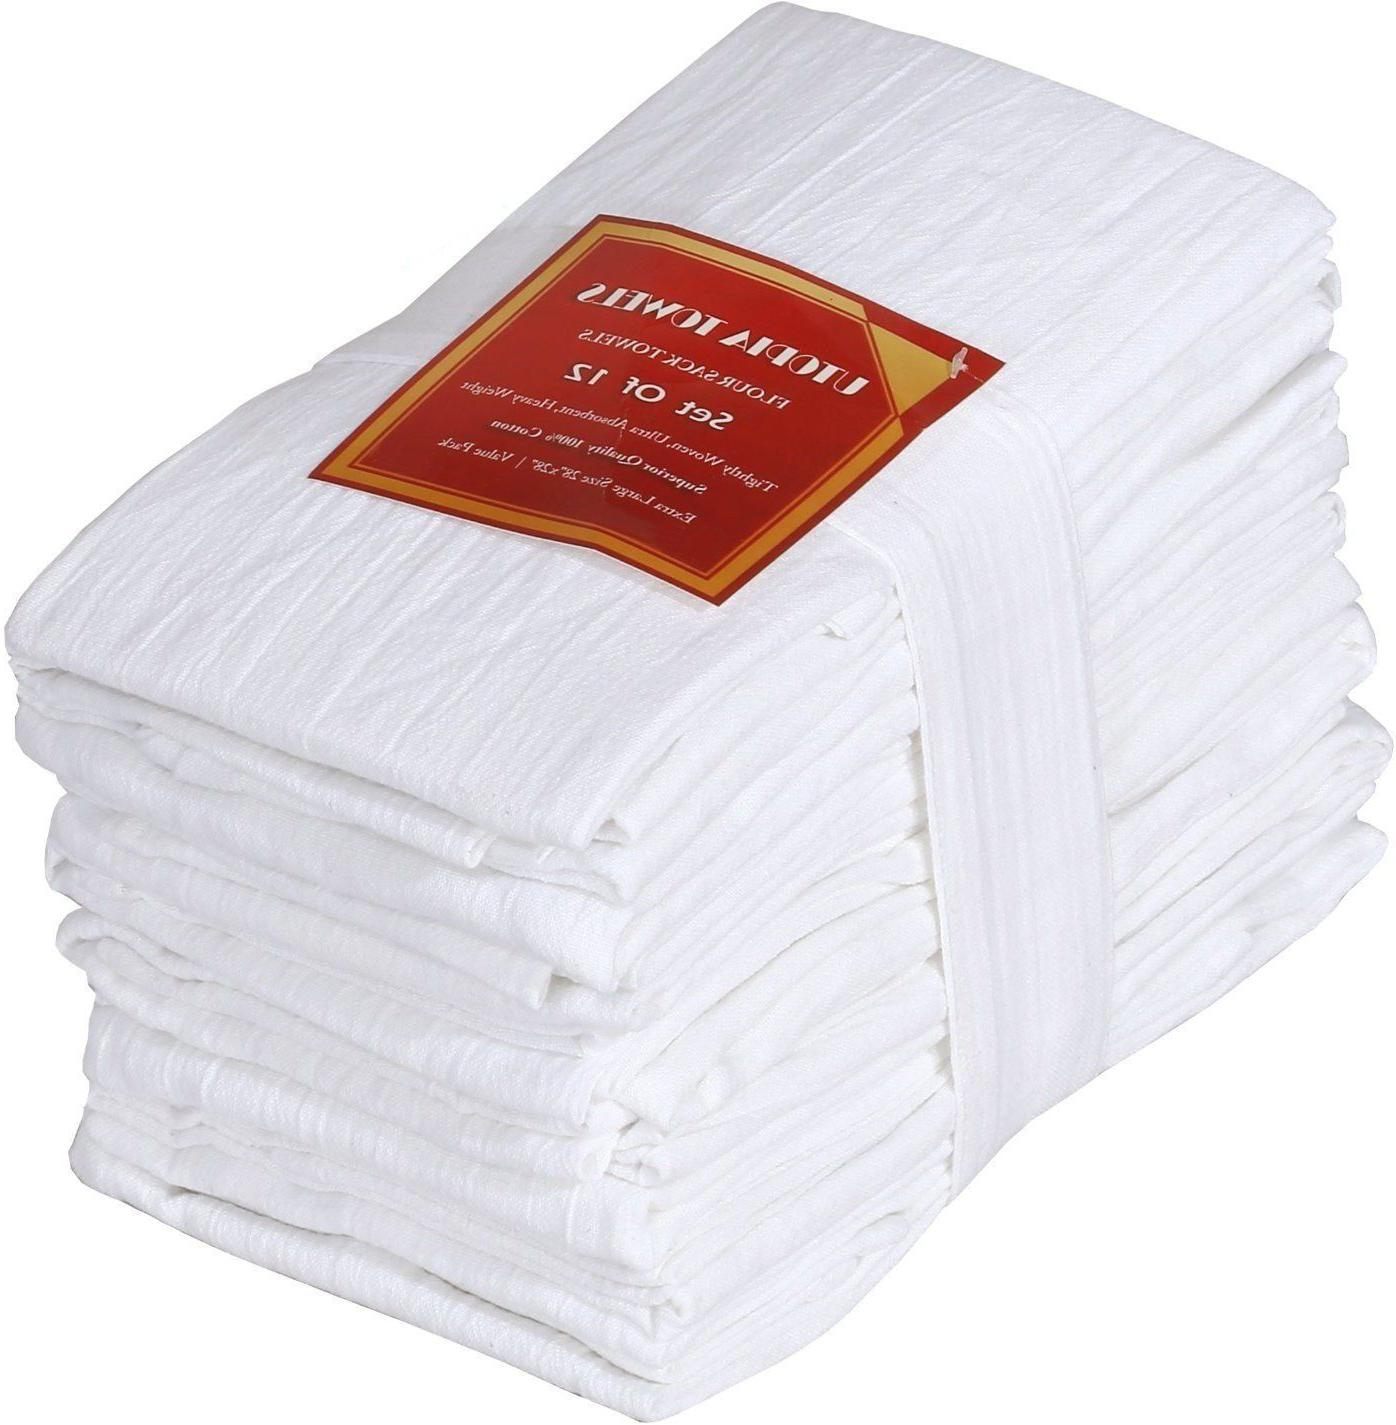 flour sack towels cotton absorbent 12 pack